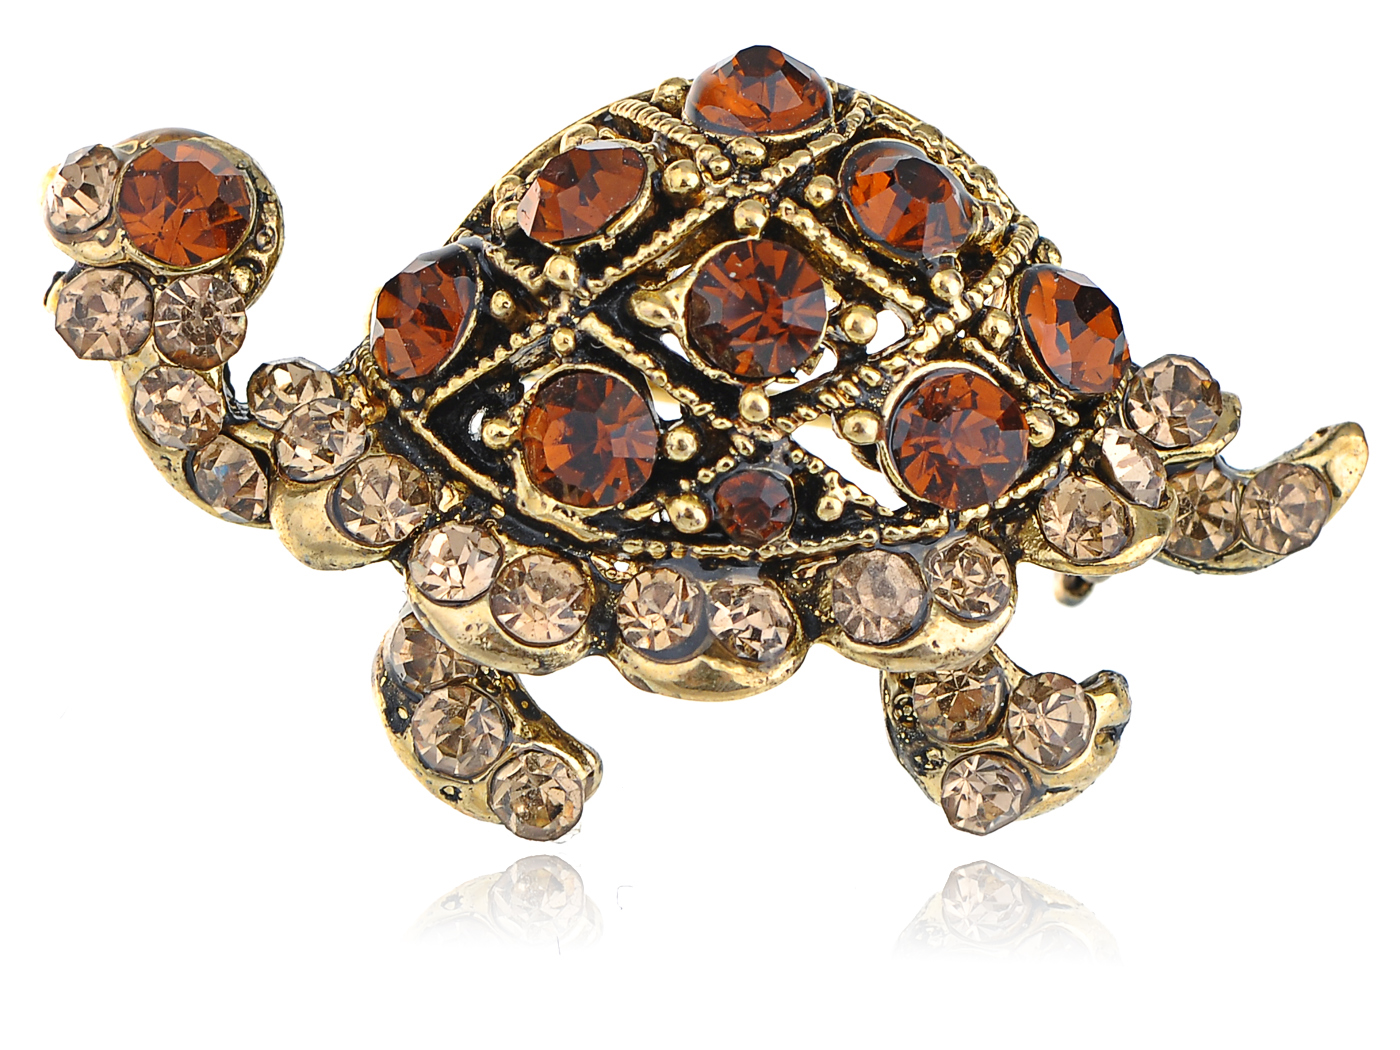 Golden Tone Topaz Brown Crystal Rhinestone Turtle Tortoise Reptile Pin Brooch by